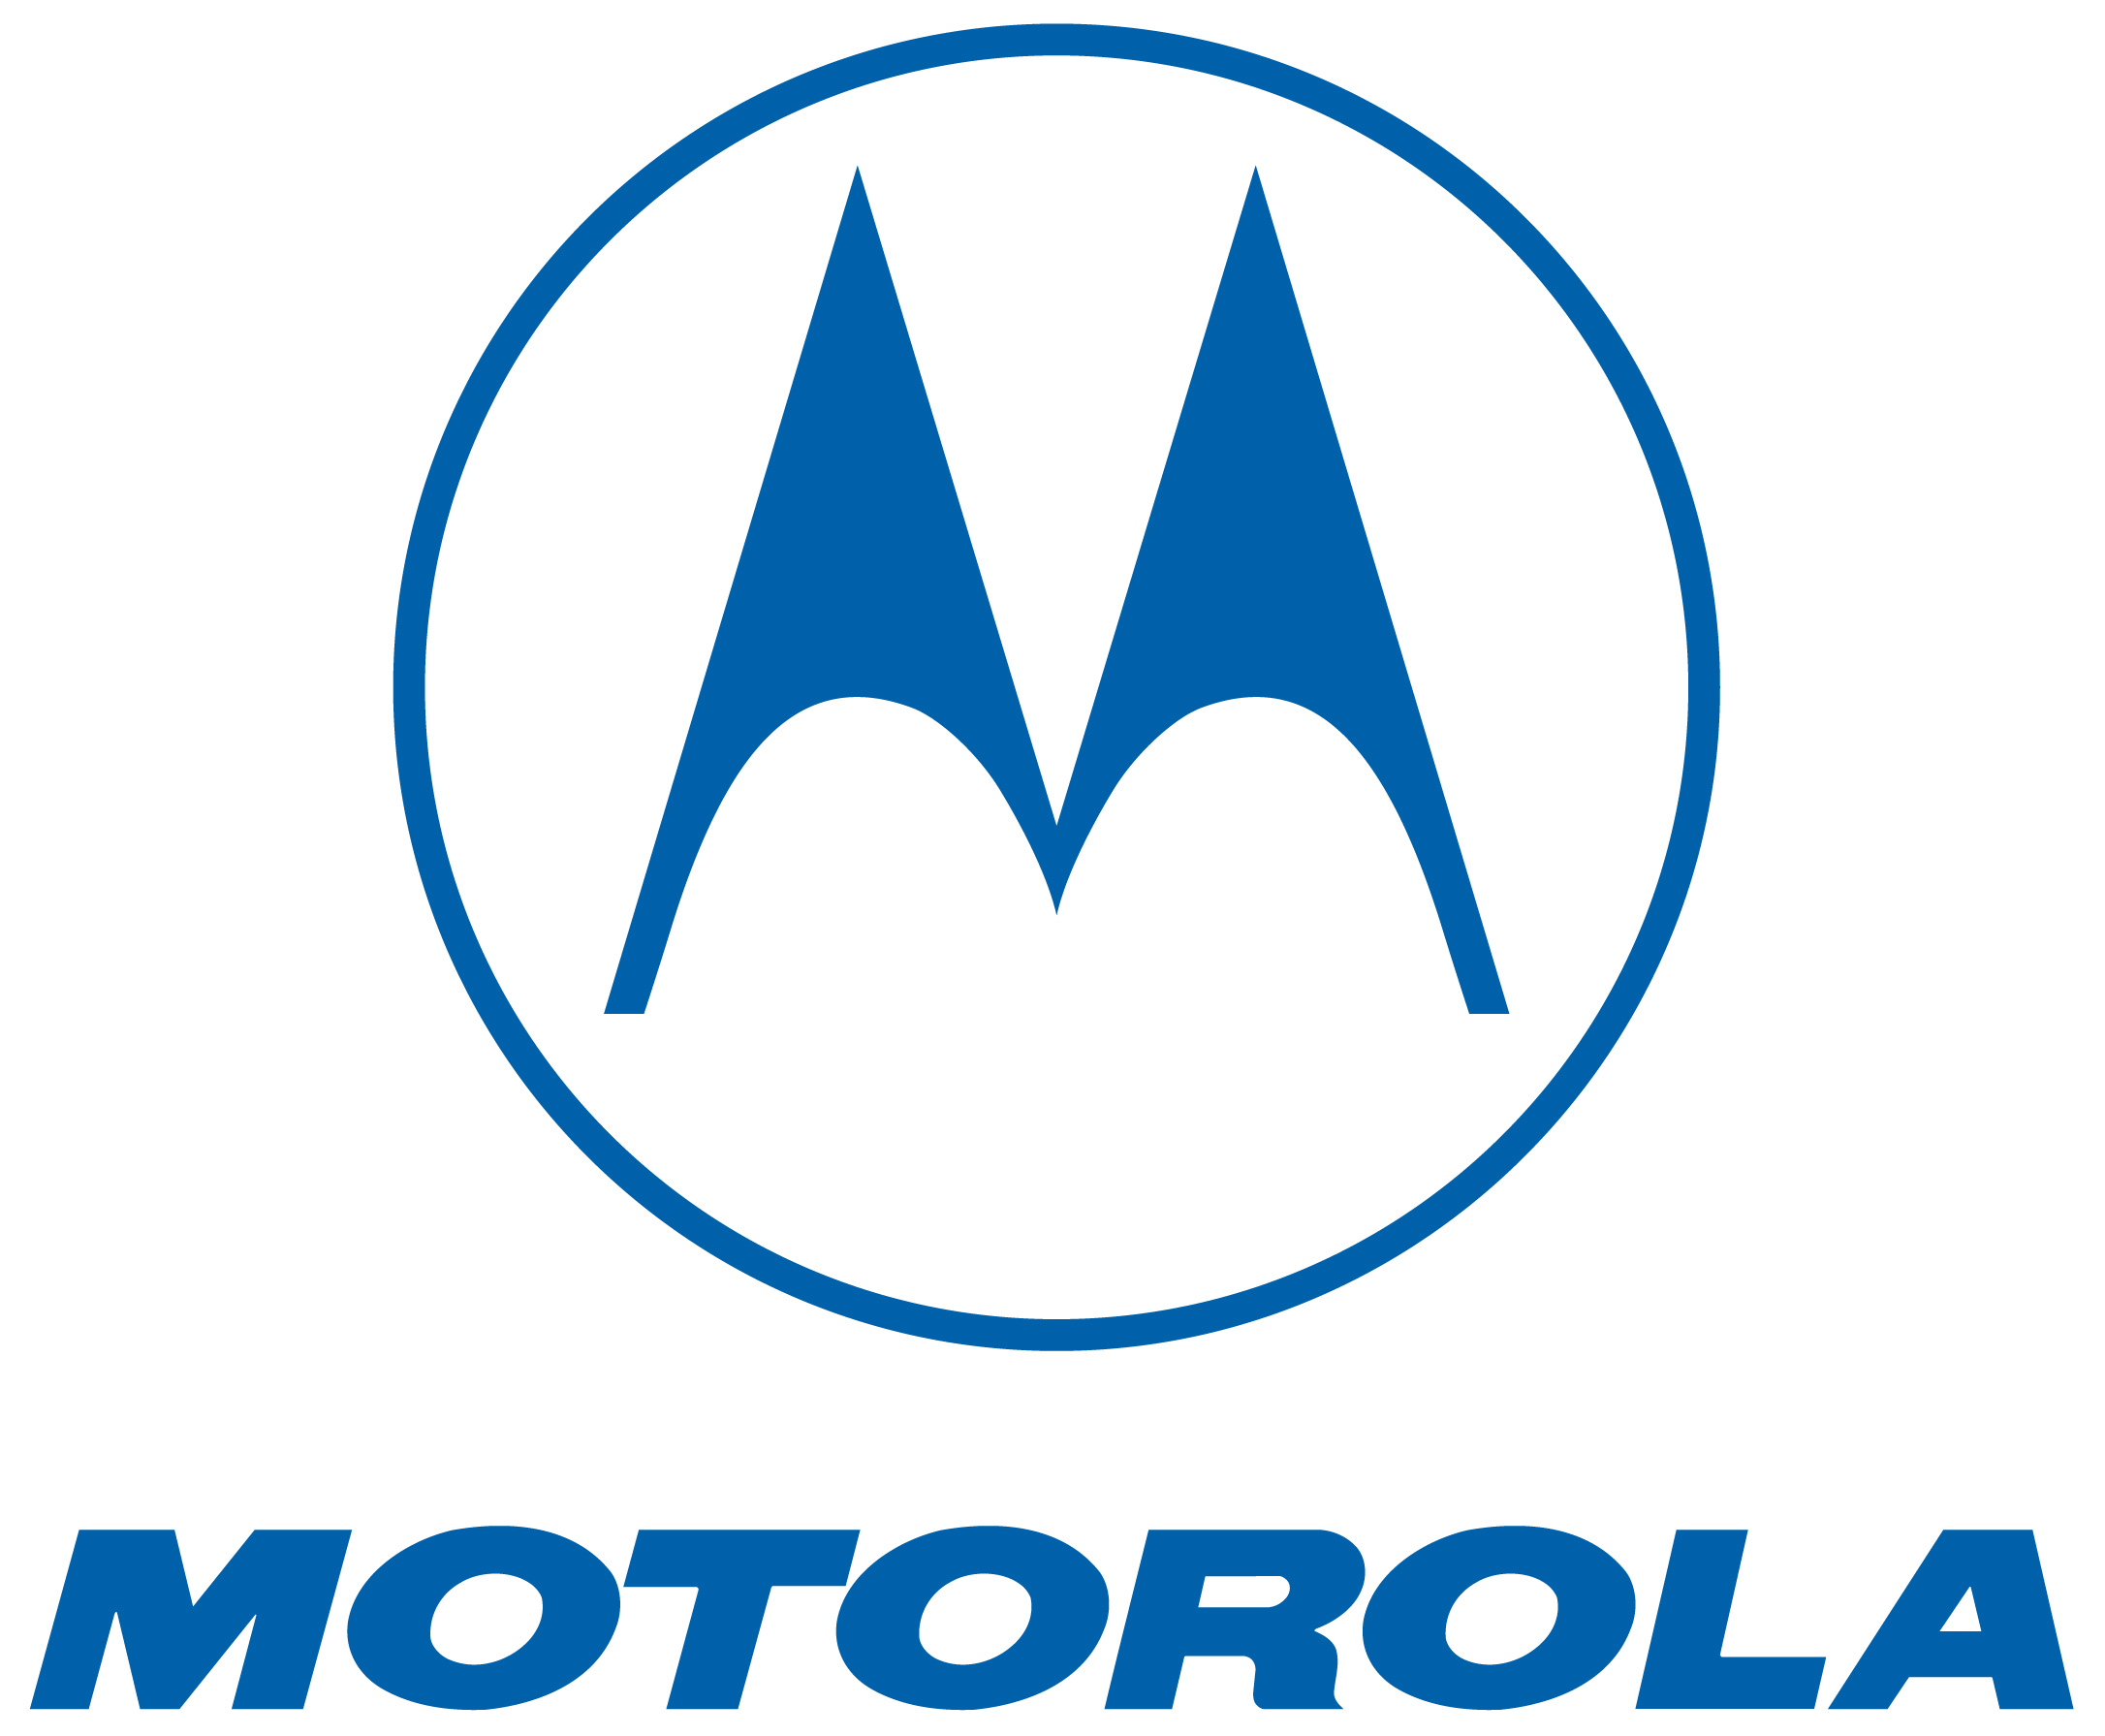 Motorola_logo-5.jpg